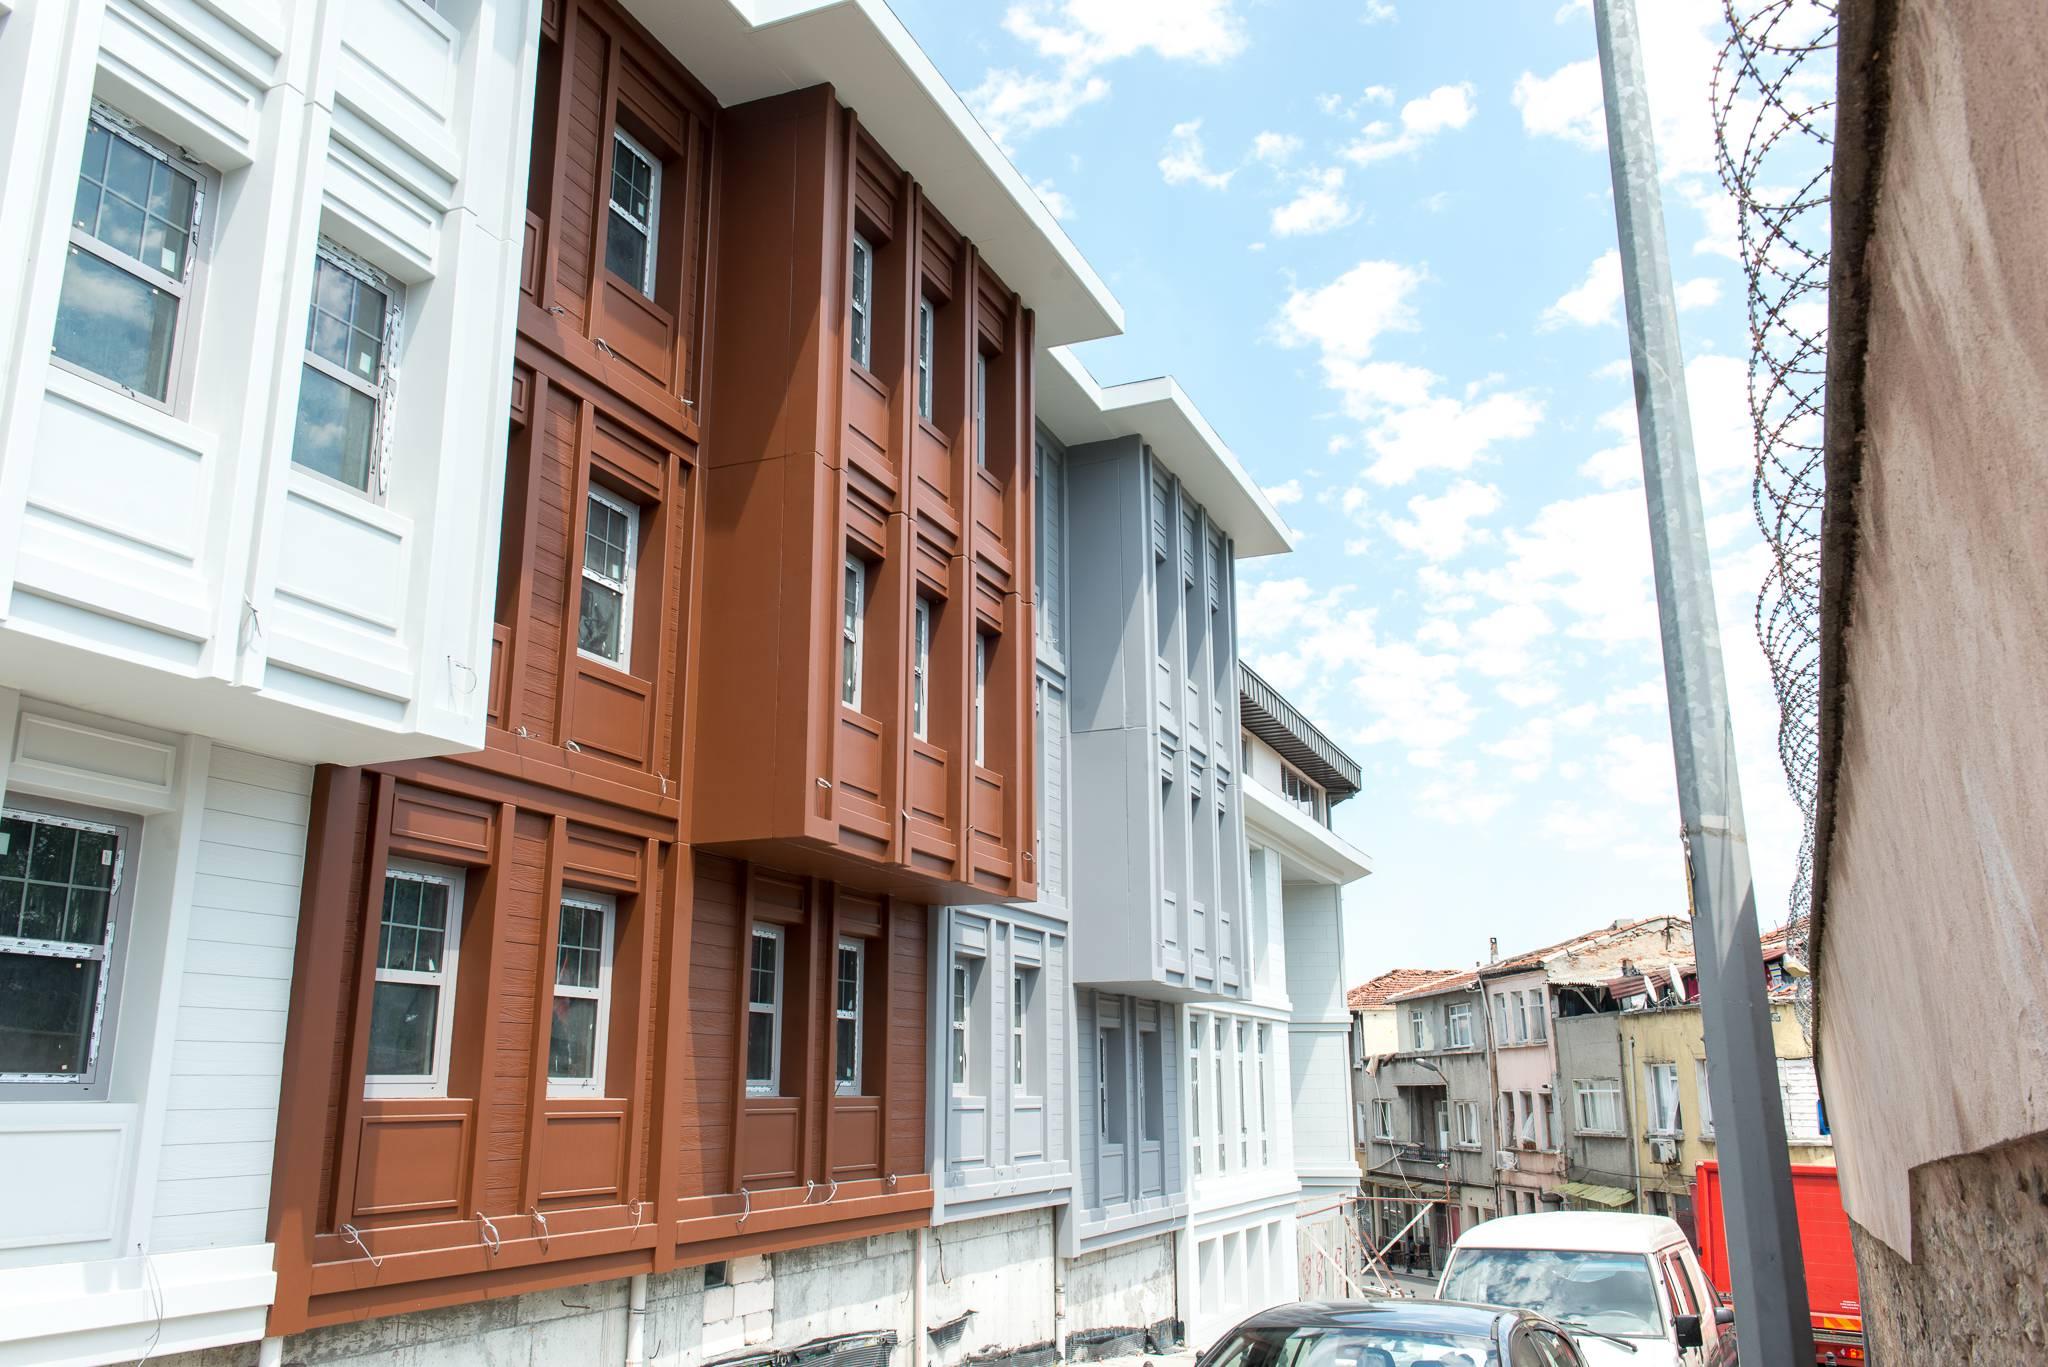 Altınboynuz Otel - Ayvansaray